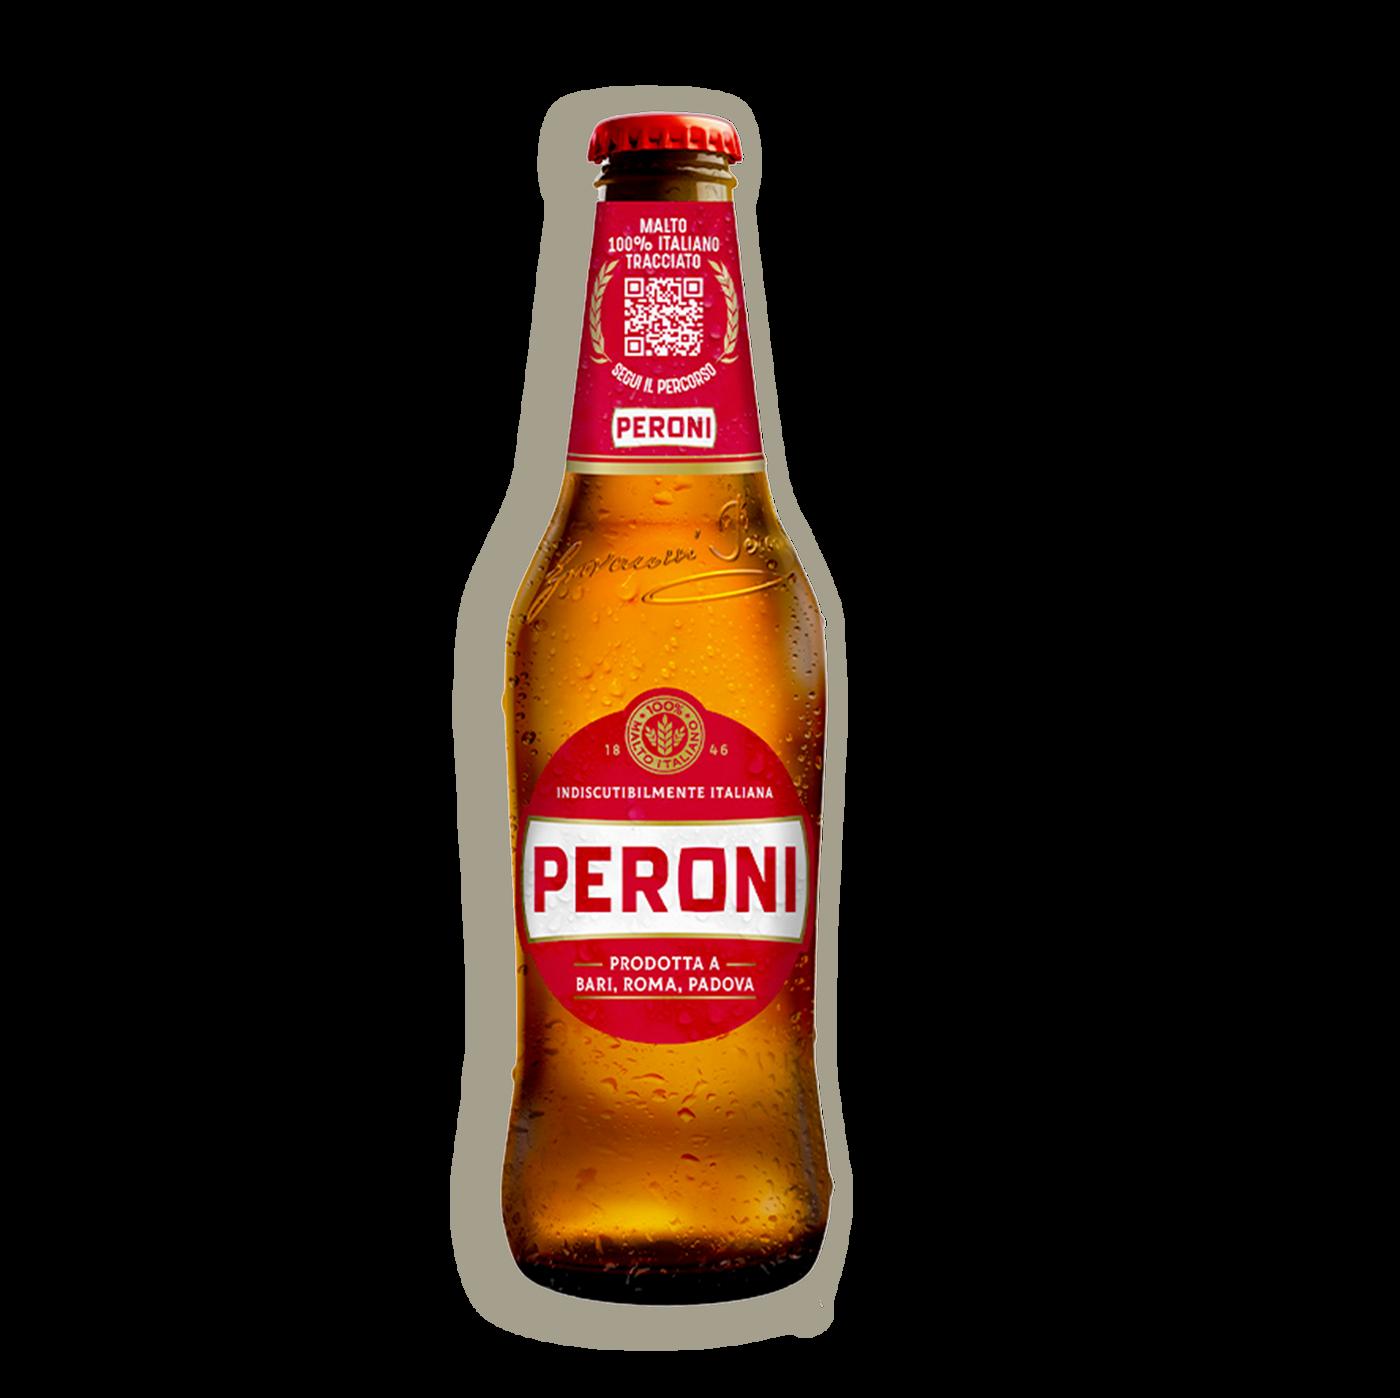 Peroni red label